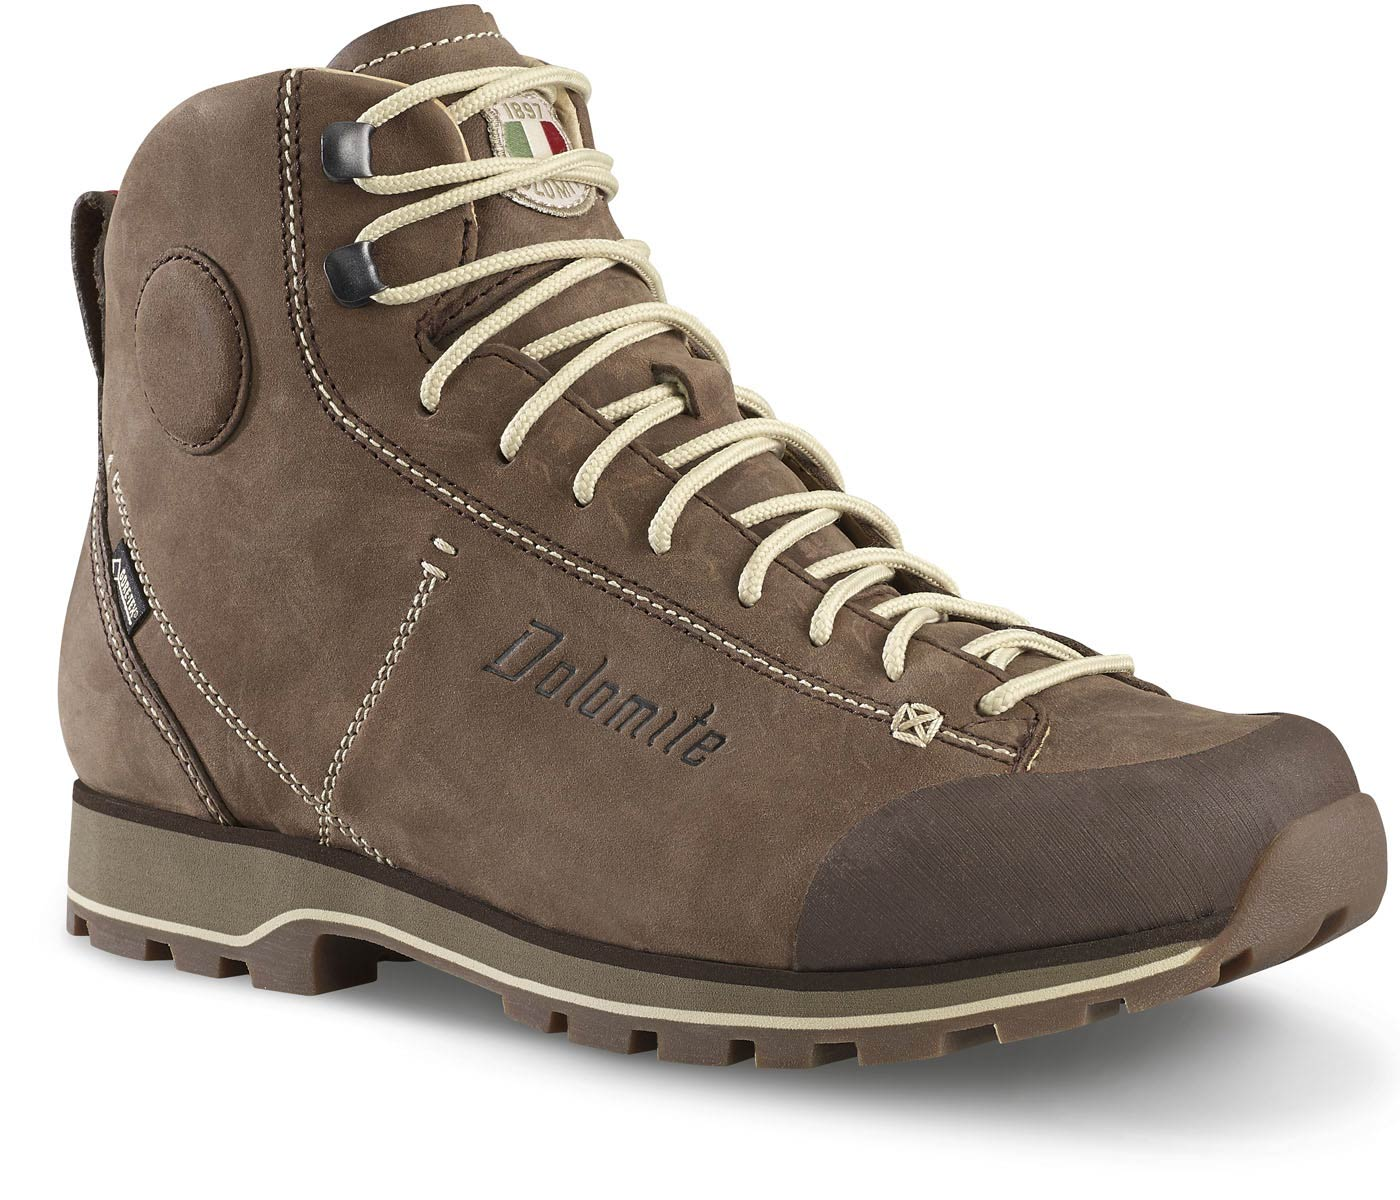 dolomite-cinquantaquattro-high-fg-gtx-boots.jpg